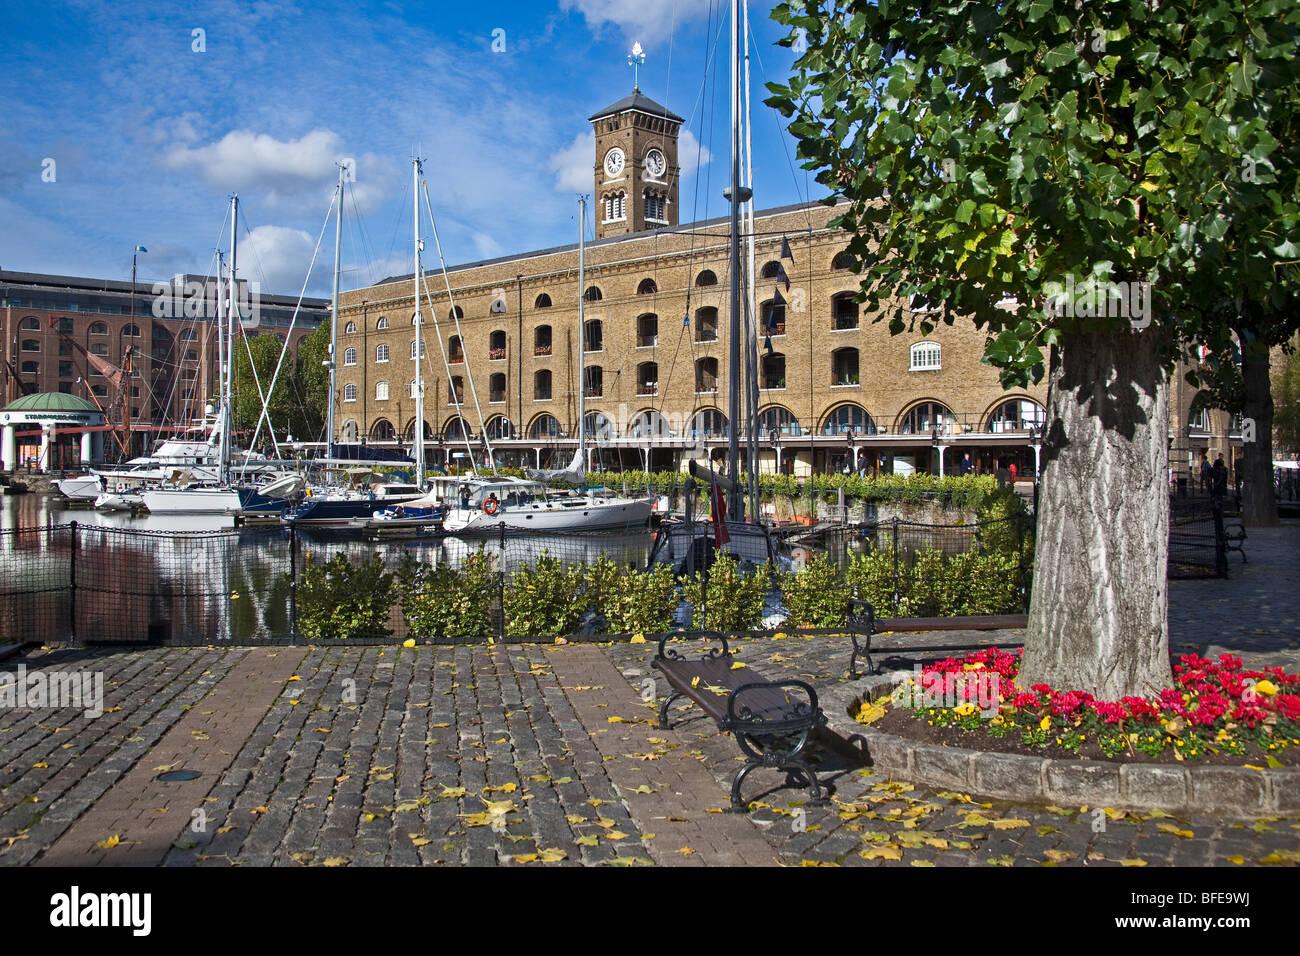 London ; St Katharine's Dock ; October 2OO9 - Stock Image